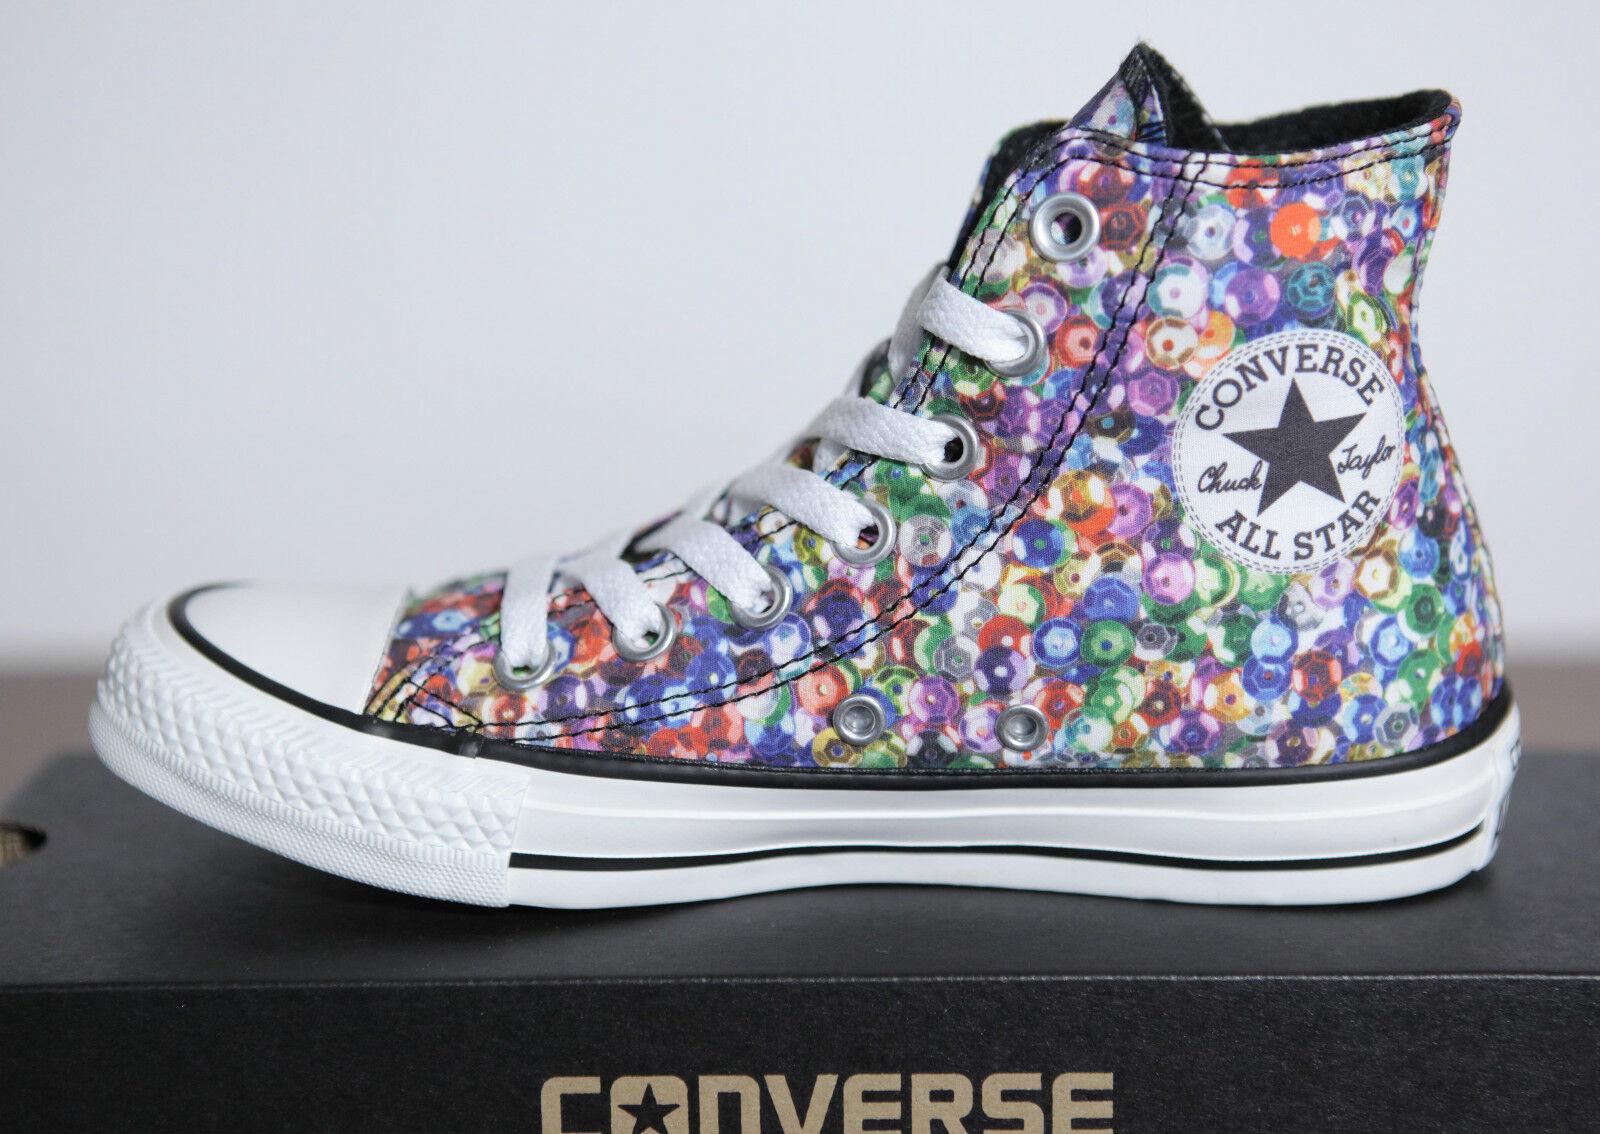 Nuevo All Star Converse Chucks Hi Can Multi blancoo 542476c Zapatillas Gr.37, 5